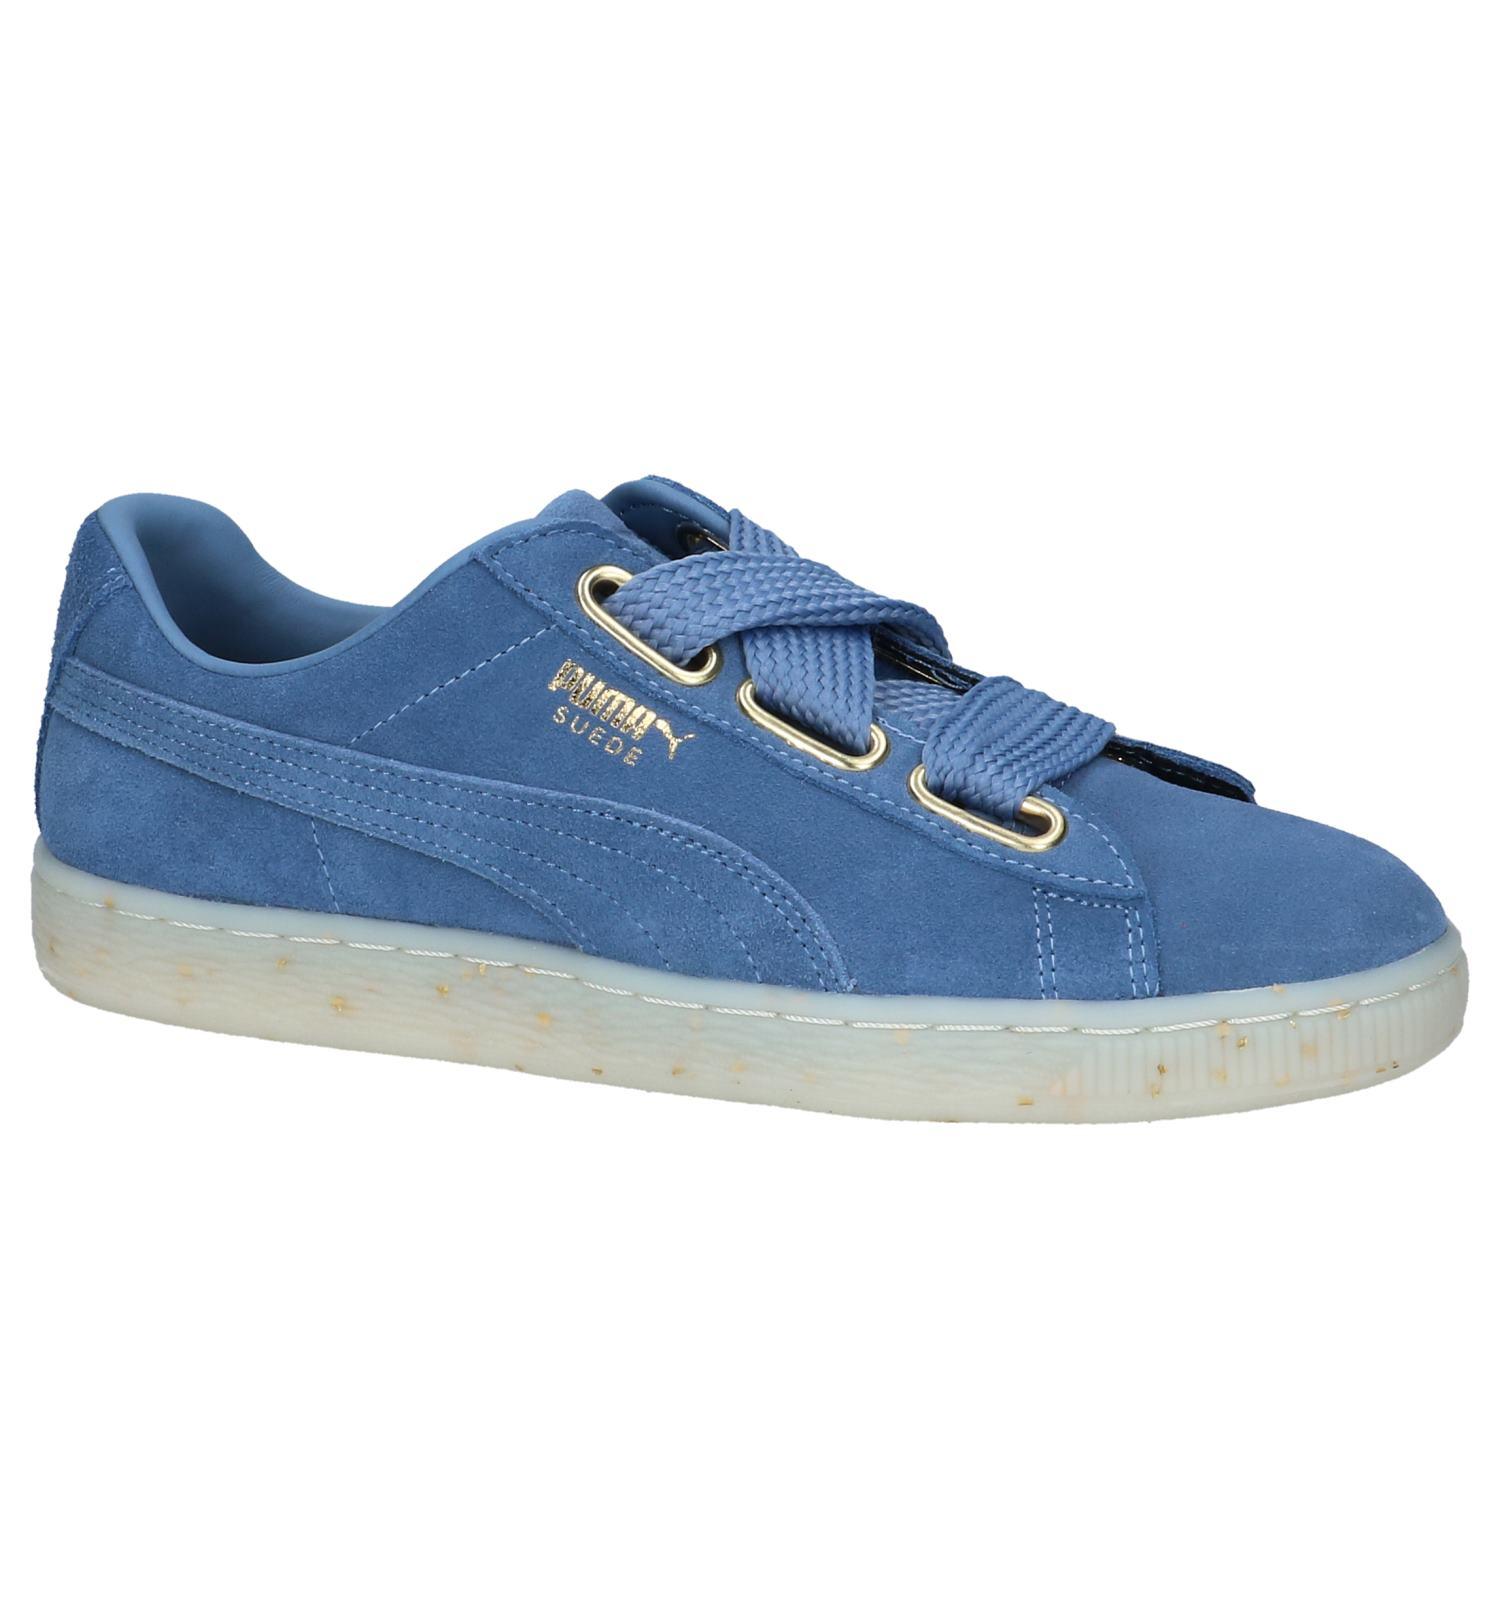 99ef33c8717 Blauwe Lage Sportieve Sneakers Puma Suede Heart | TORFS.BE | Gratis verzend  en retour